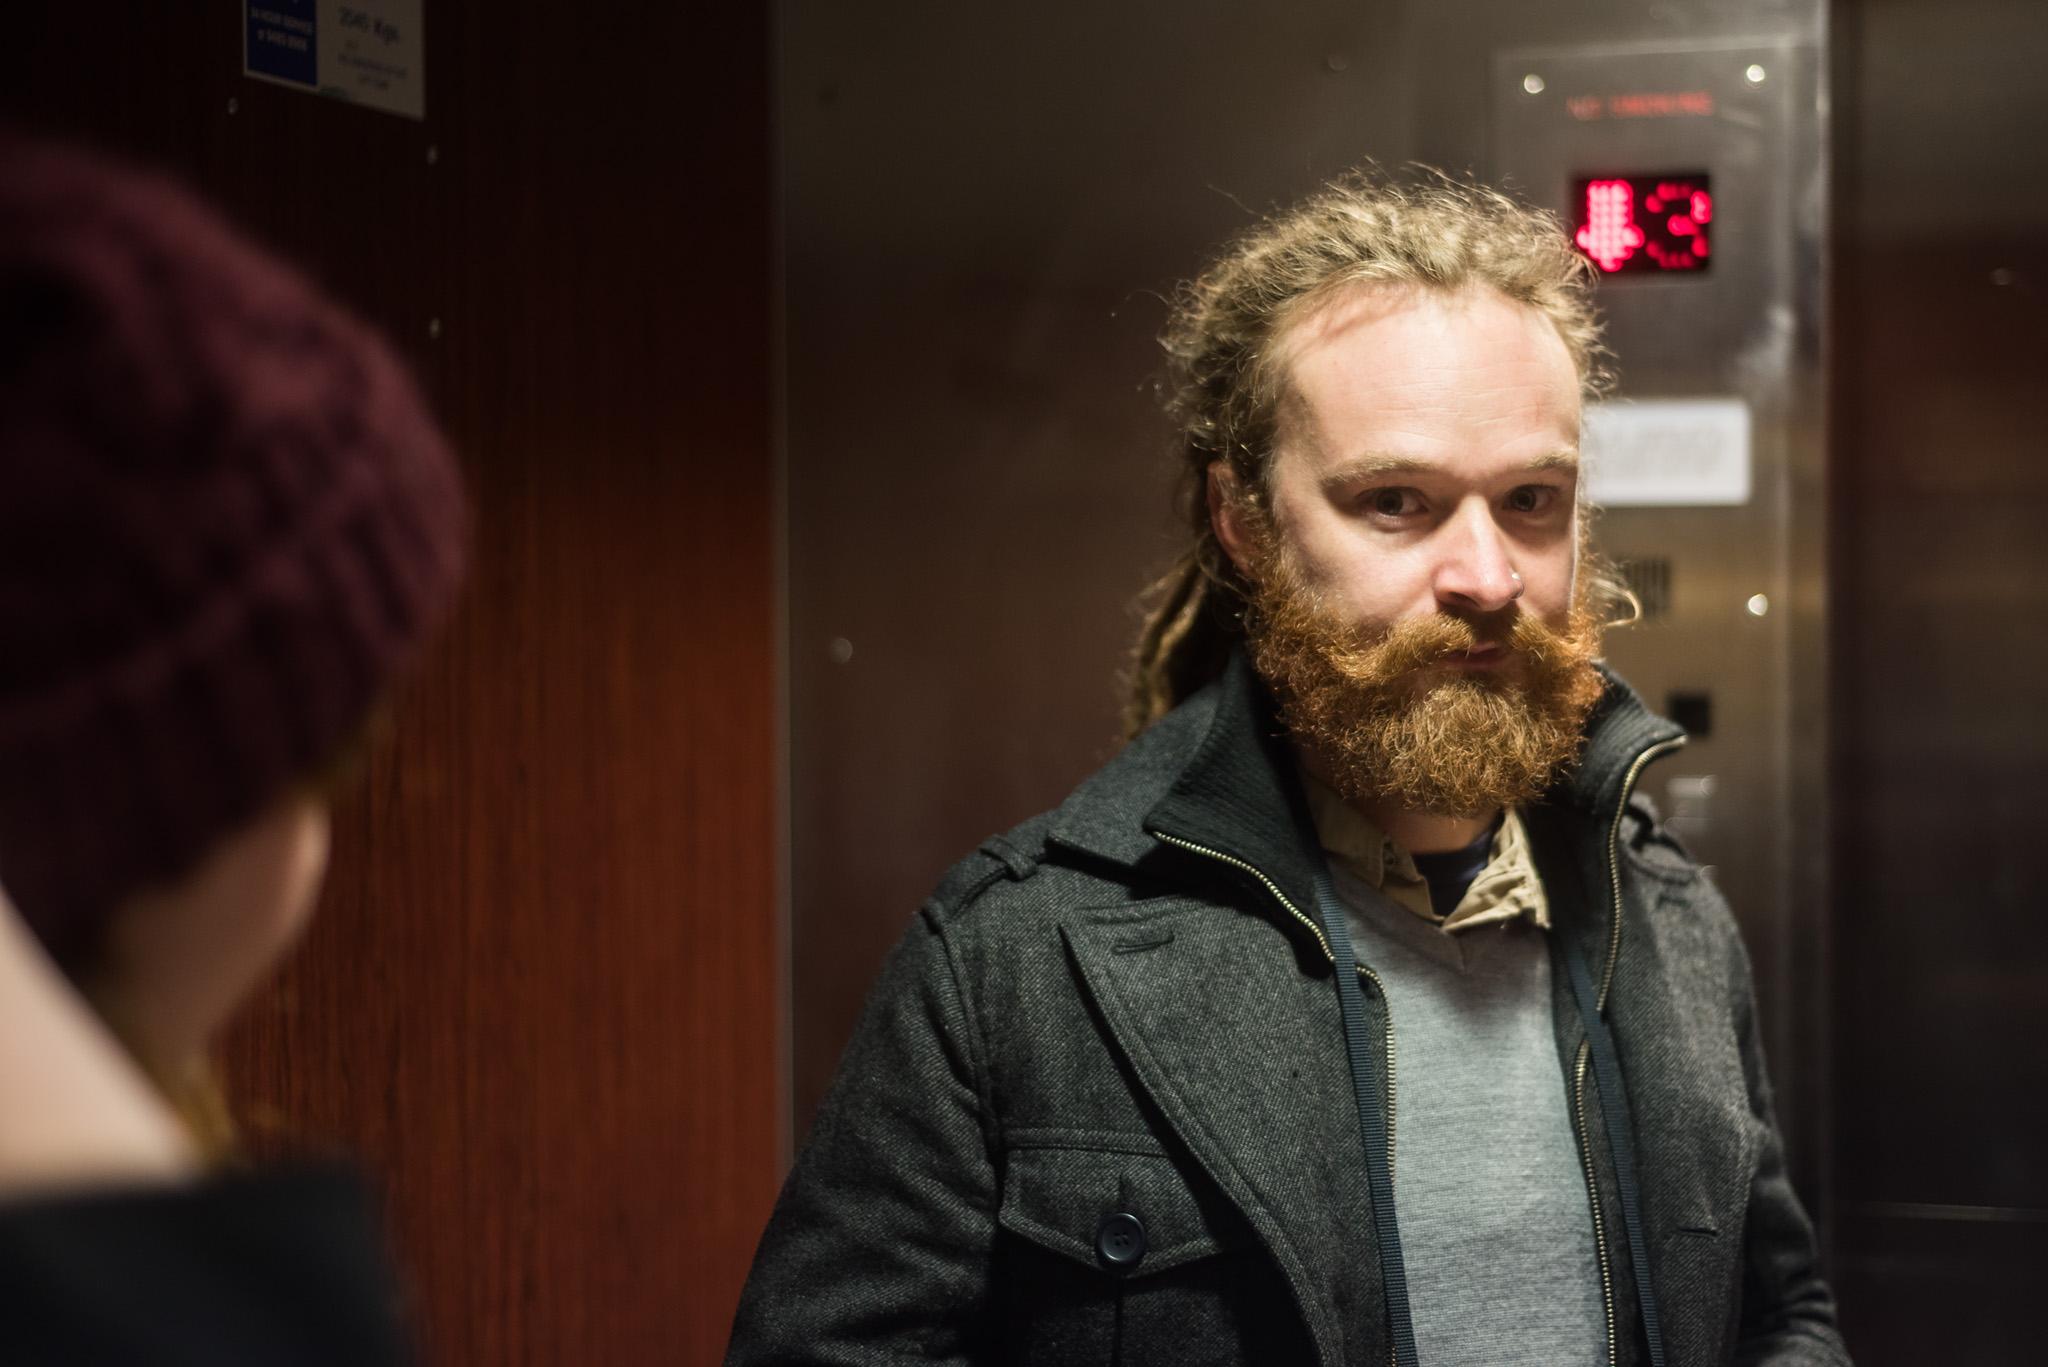 Asher in an elevator. Melbourne © Daniel Purvis